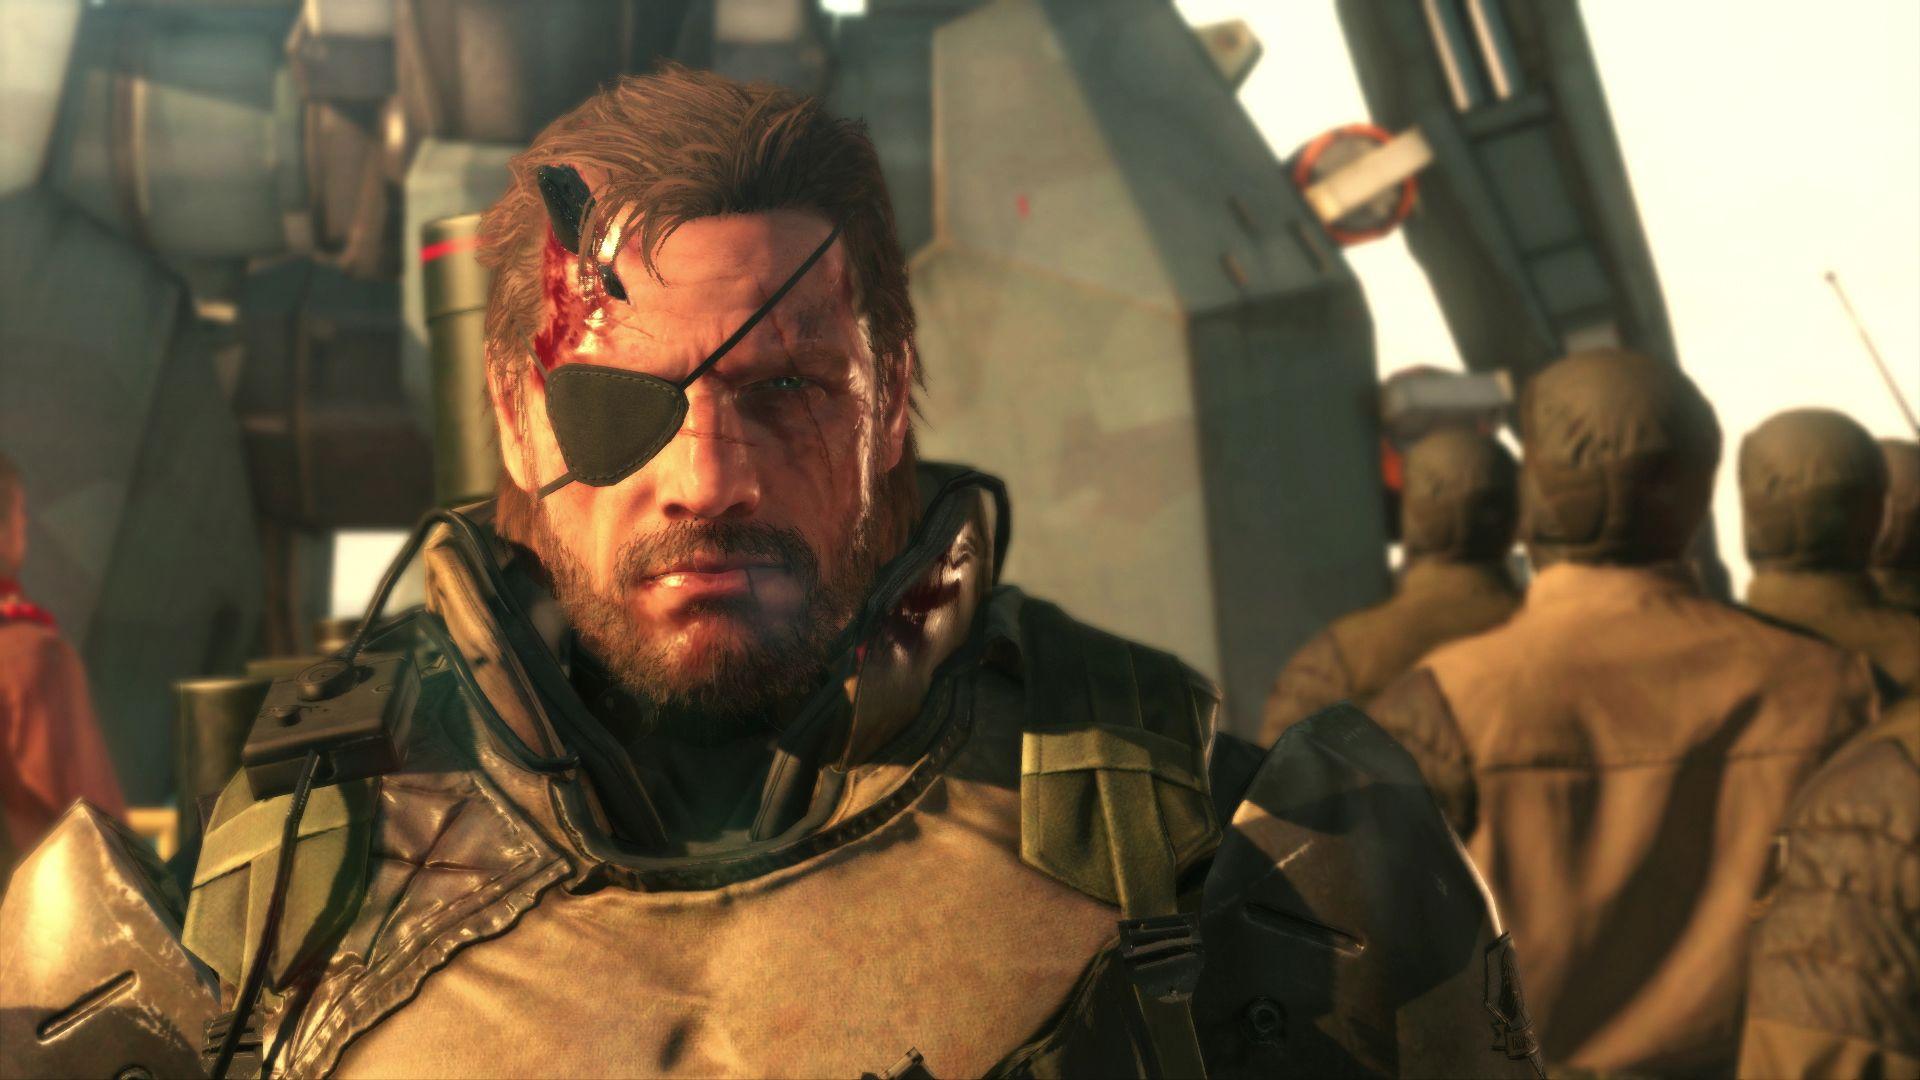 Spousta nových HD obrázků z Metal Gear Solid V: The Phantom Pain 110498